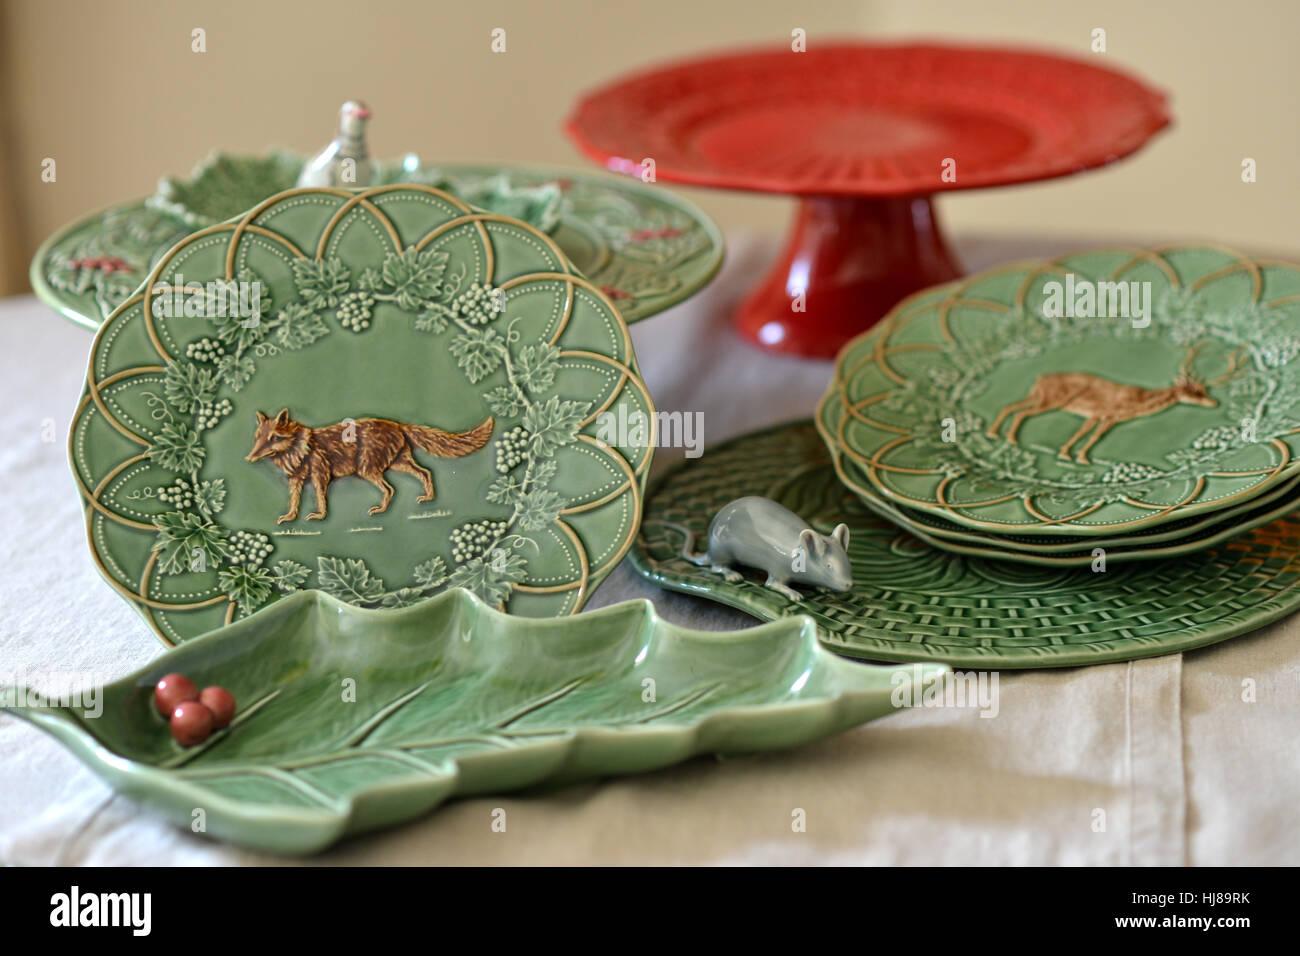 Bordallo Pinheiro Portuguese ceramics - Stock Image & Bordallo Pinheiro Tableware Stock Photos u0026 Bordallo Pinheiro ...